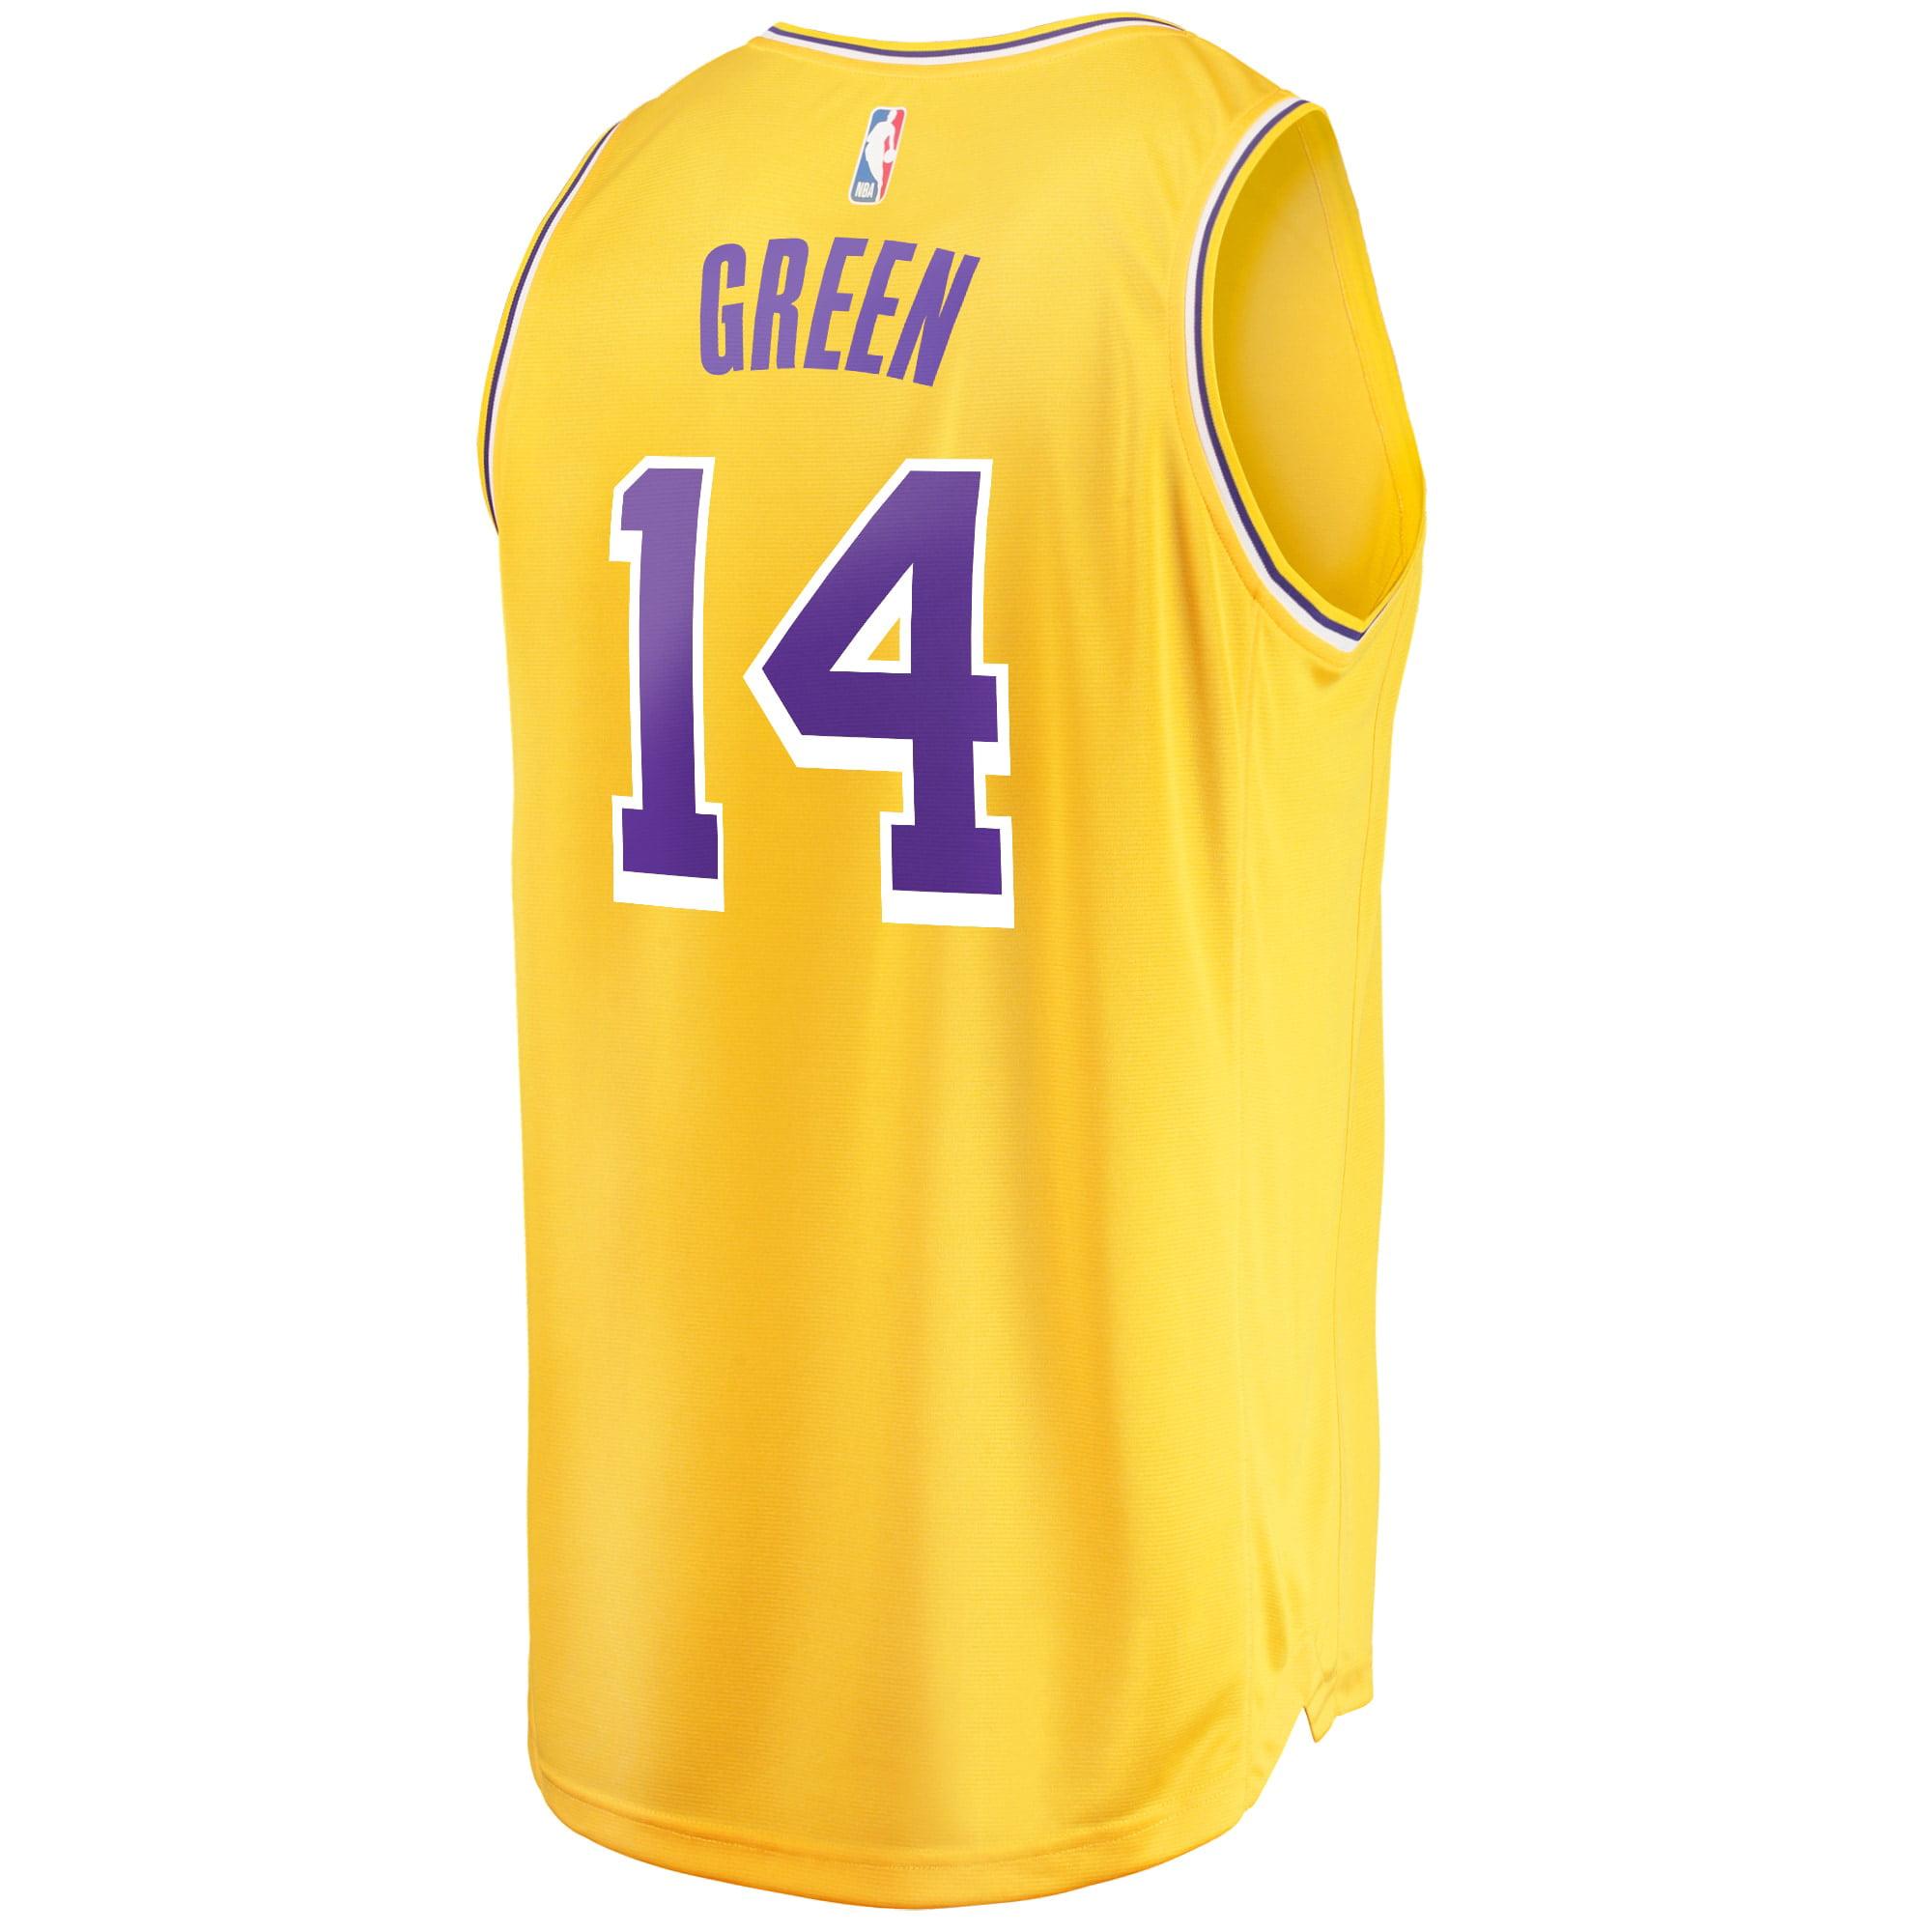 Danny Green Los Angeles Lakers Fanatics Branded Fast Break Replica Player Jersey - Icon Edition - Gold